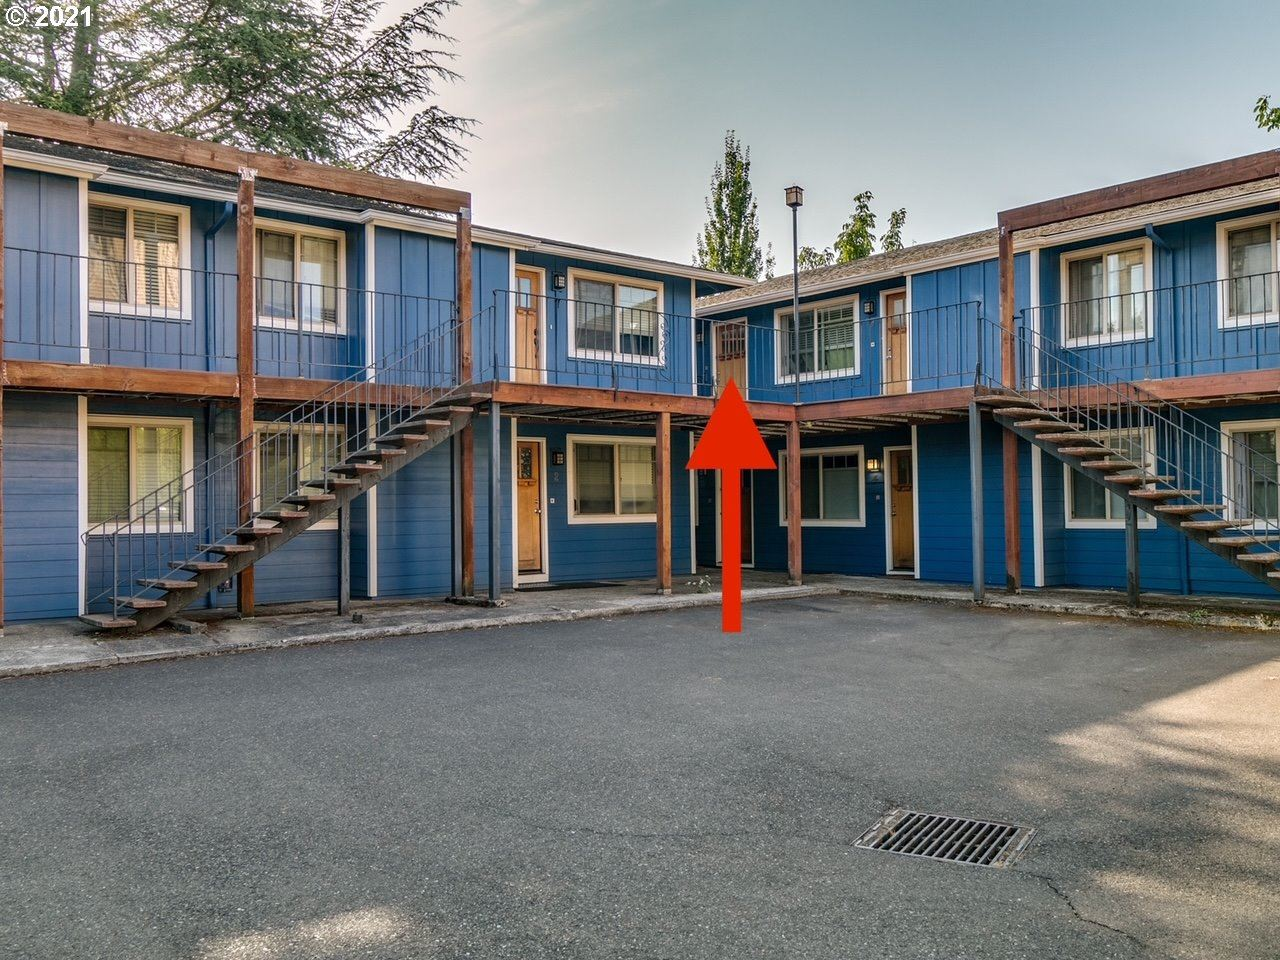 4956 NE 9TH AVE #8, Portland, OR 97211 - MLS#: 21475187